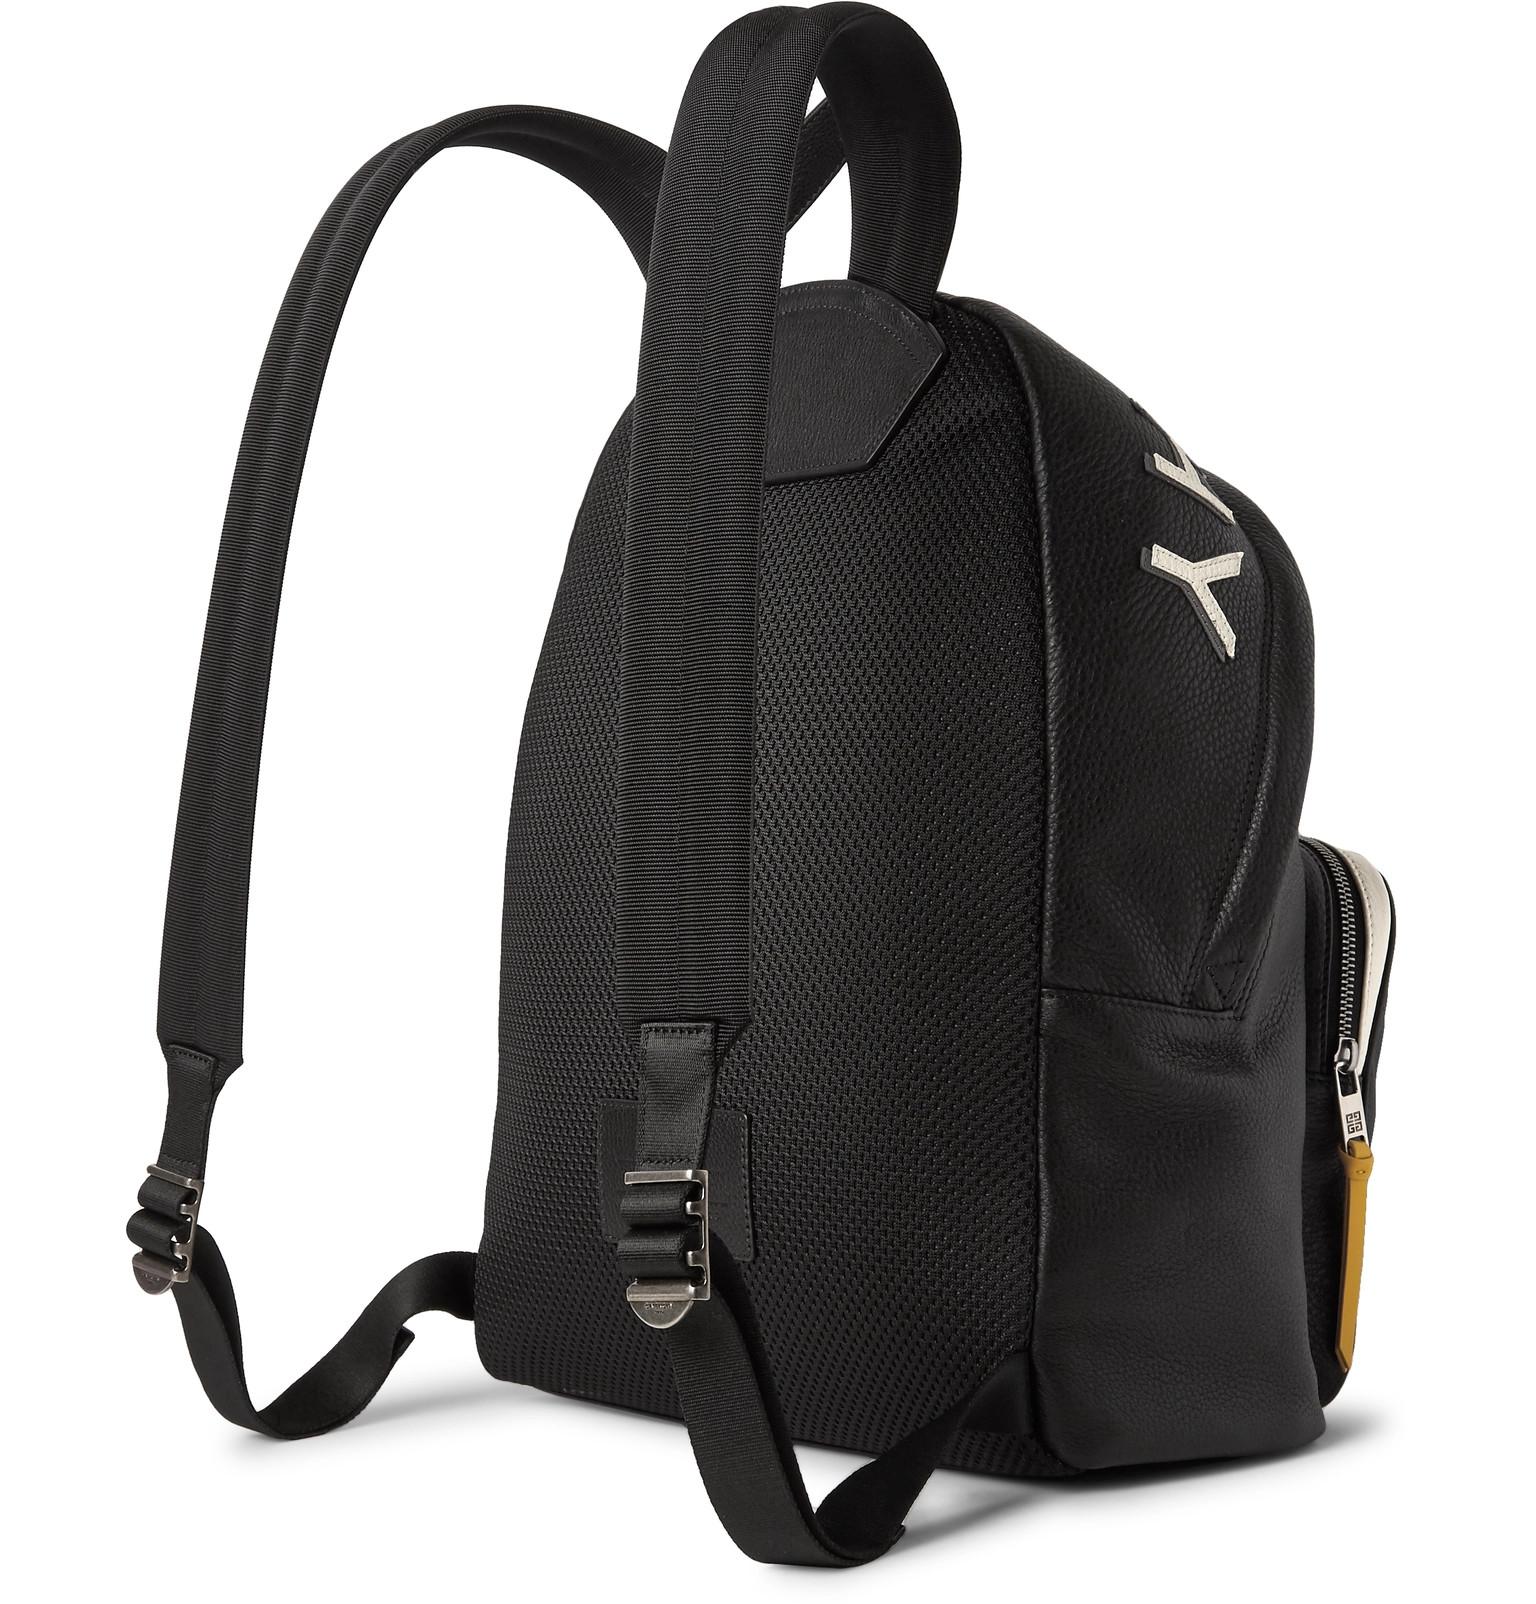 2b975774c8 Givenchy - MC3 Appliquéd Full-Grain Leather Backpack